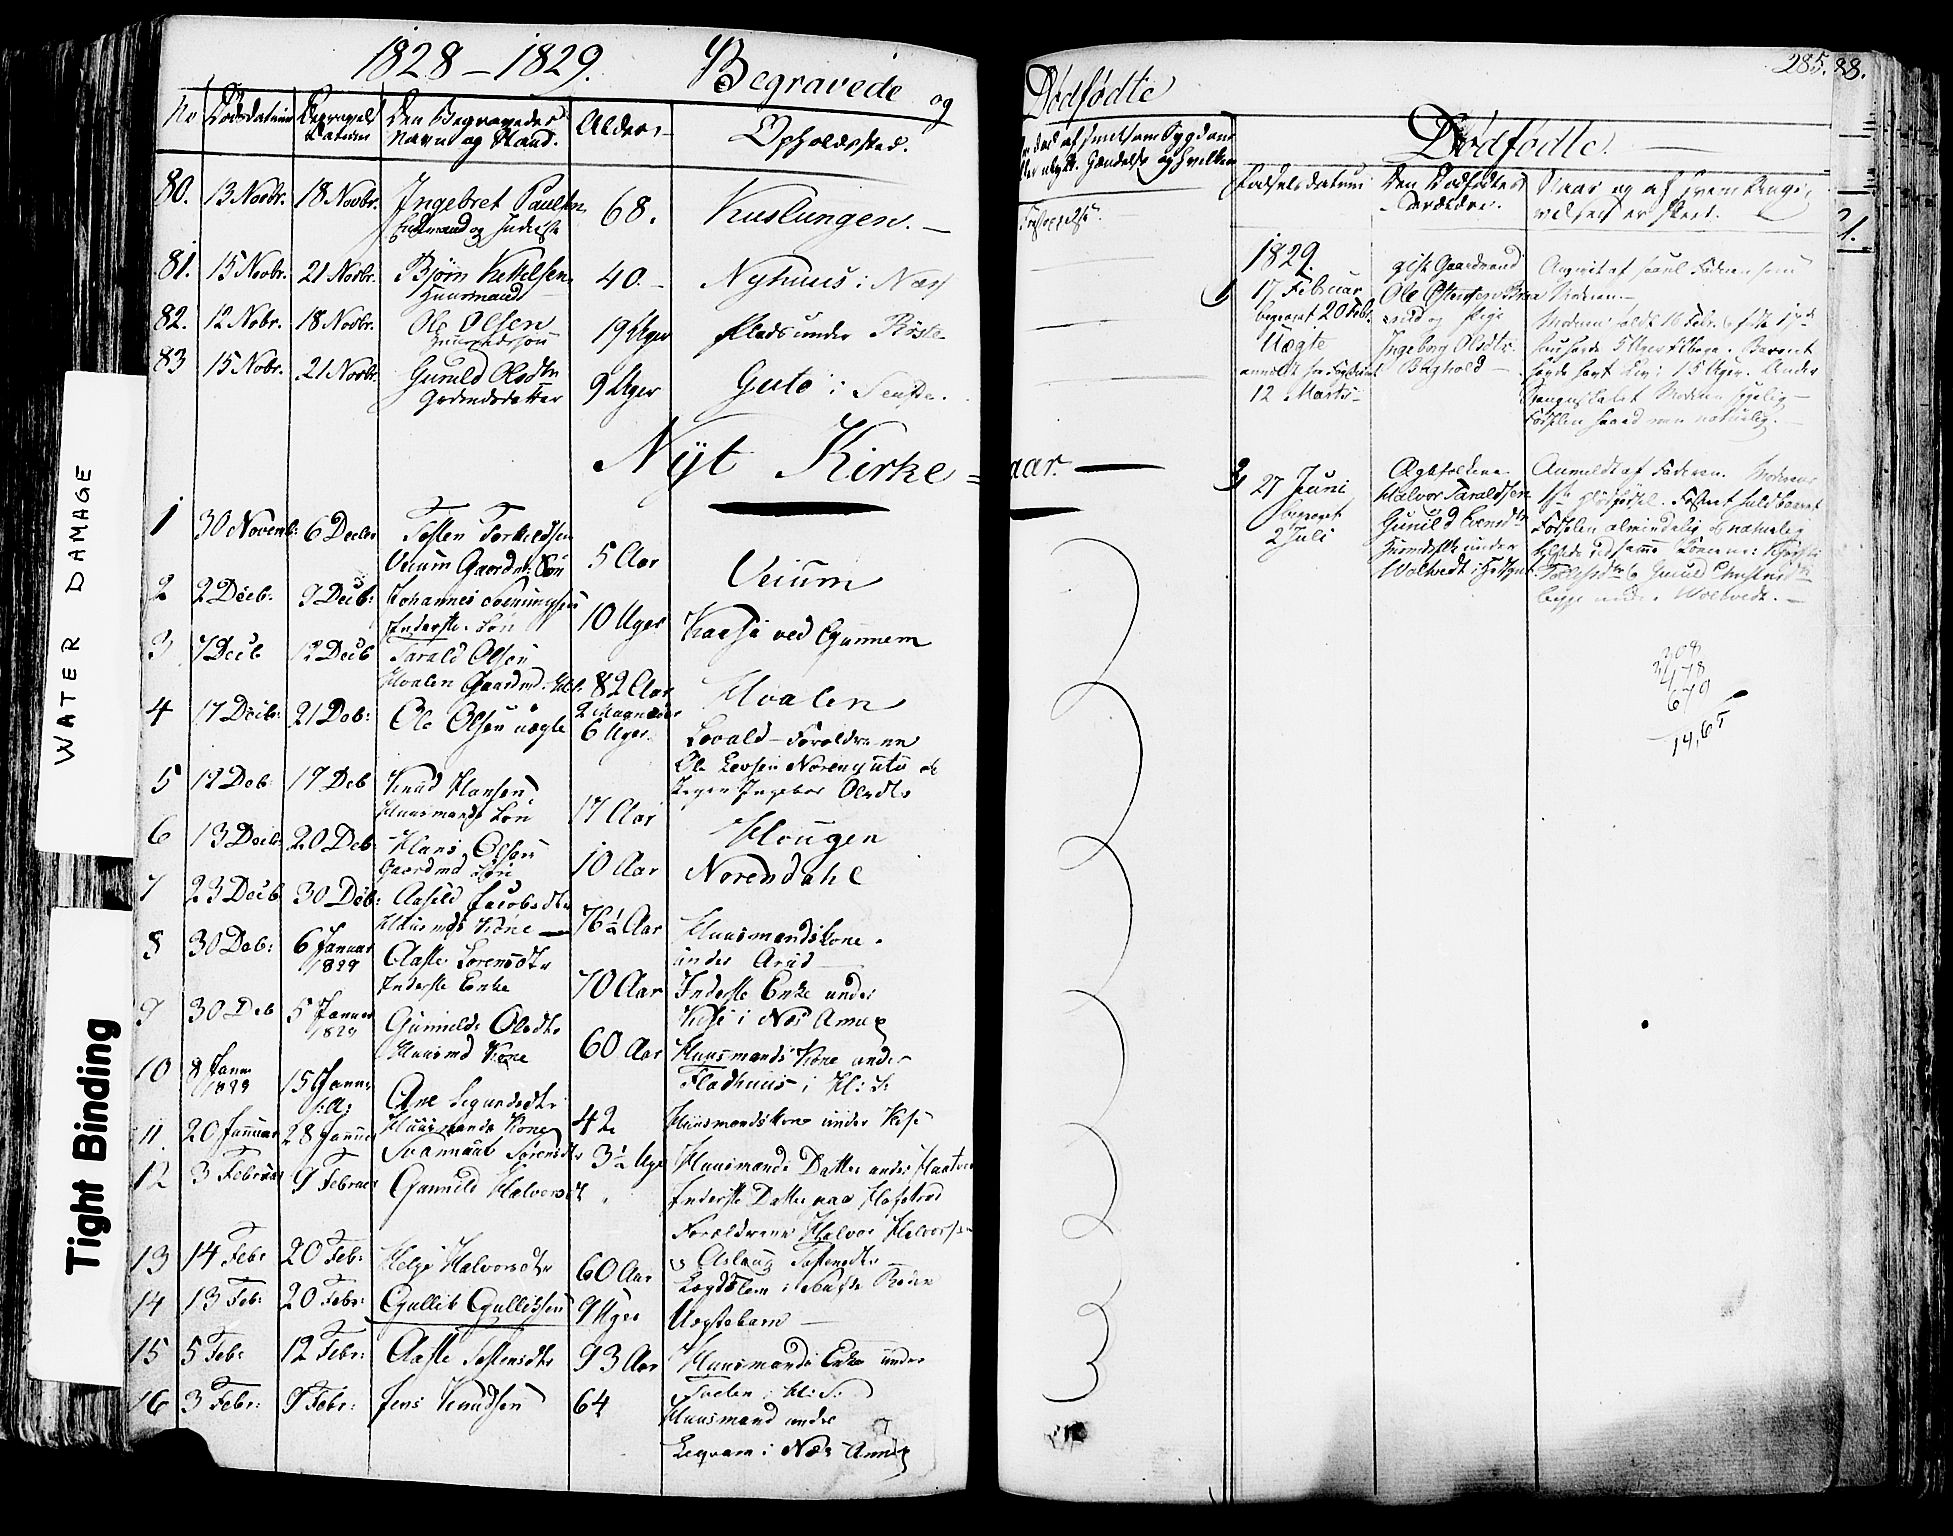 SAKO, Sauherad kirkebøker, F/Fa/L0006: Ministerialbok nr. I 6, 1827-1850, s. 285